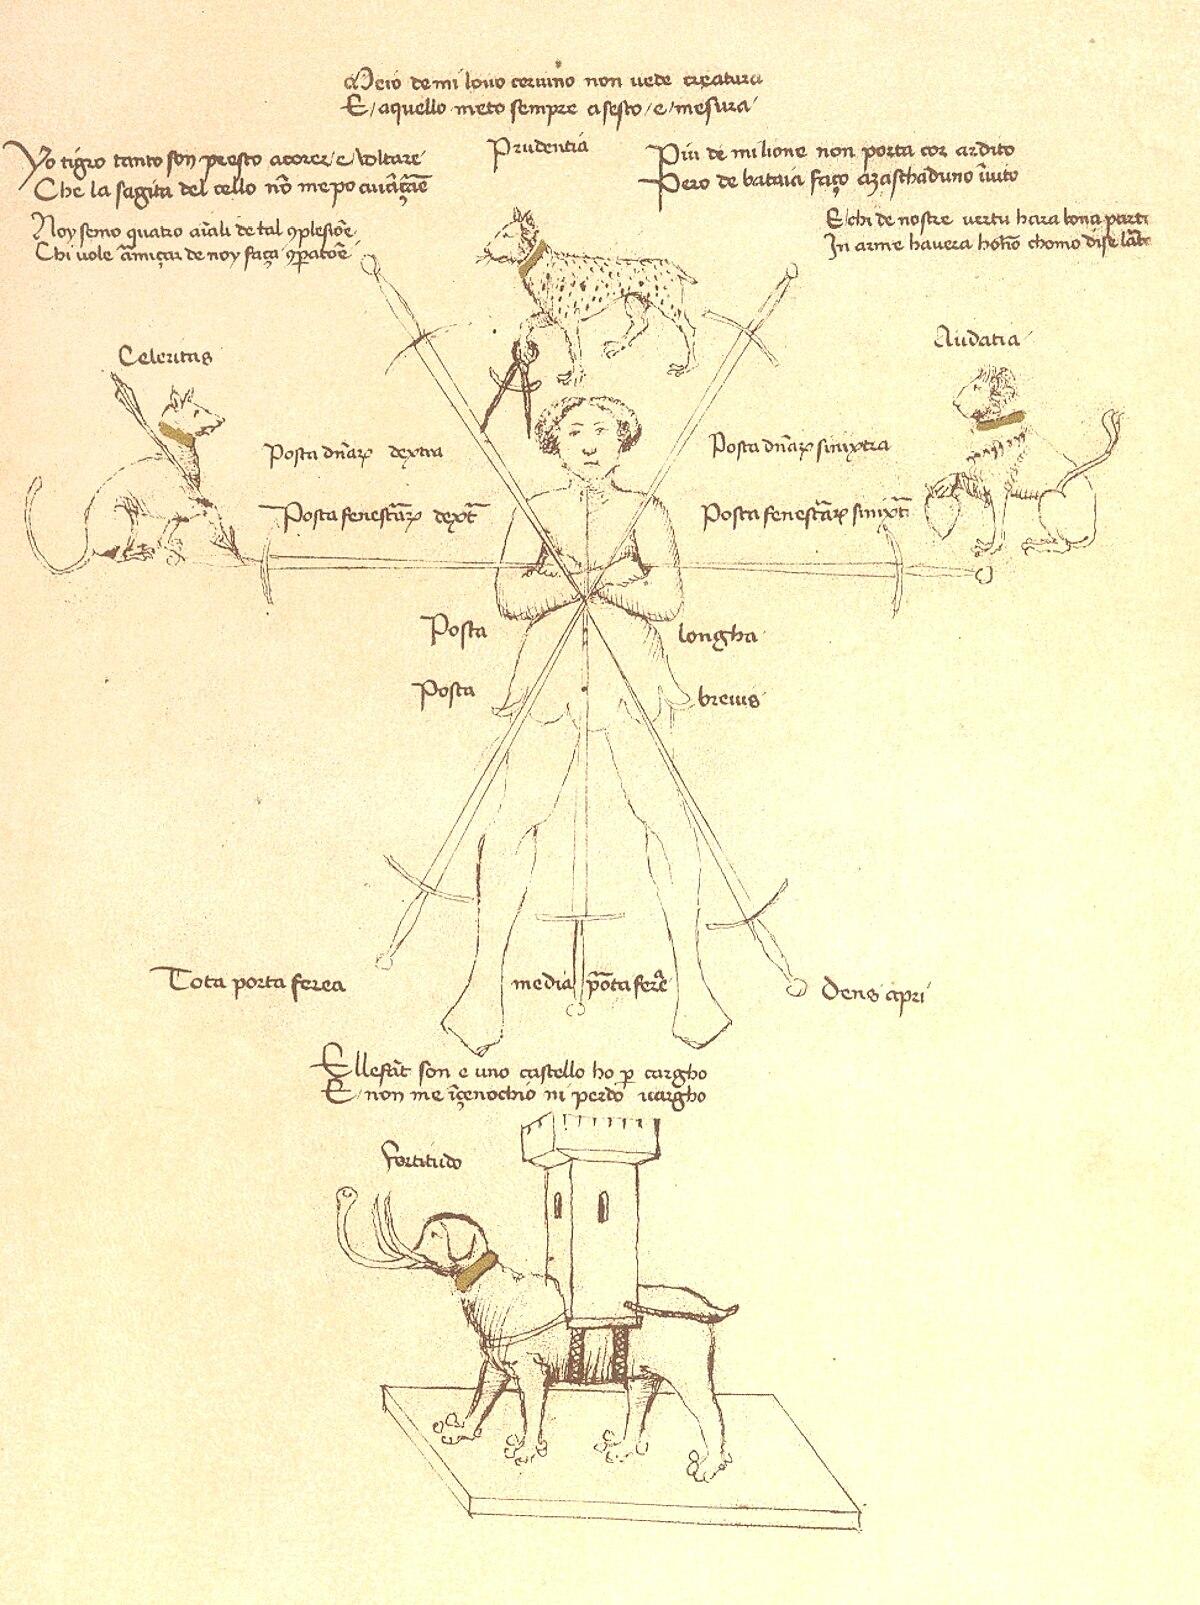 Italian school of swordsmanship - Wikipedia